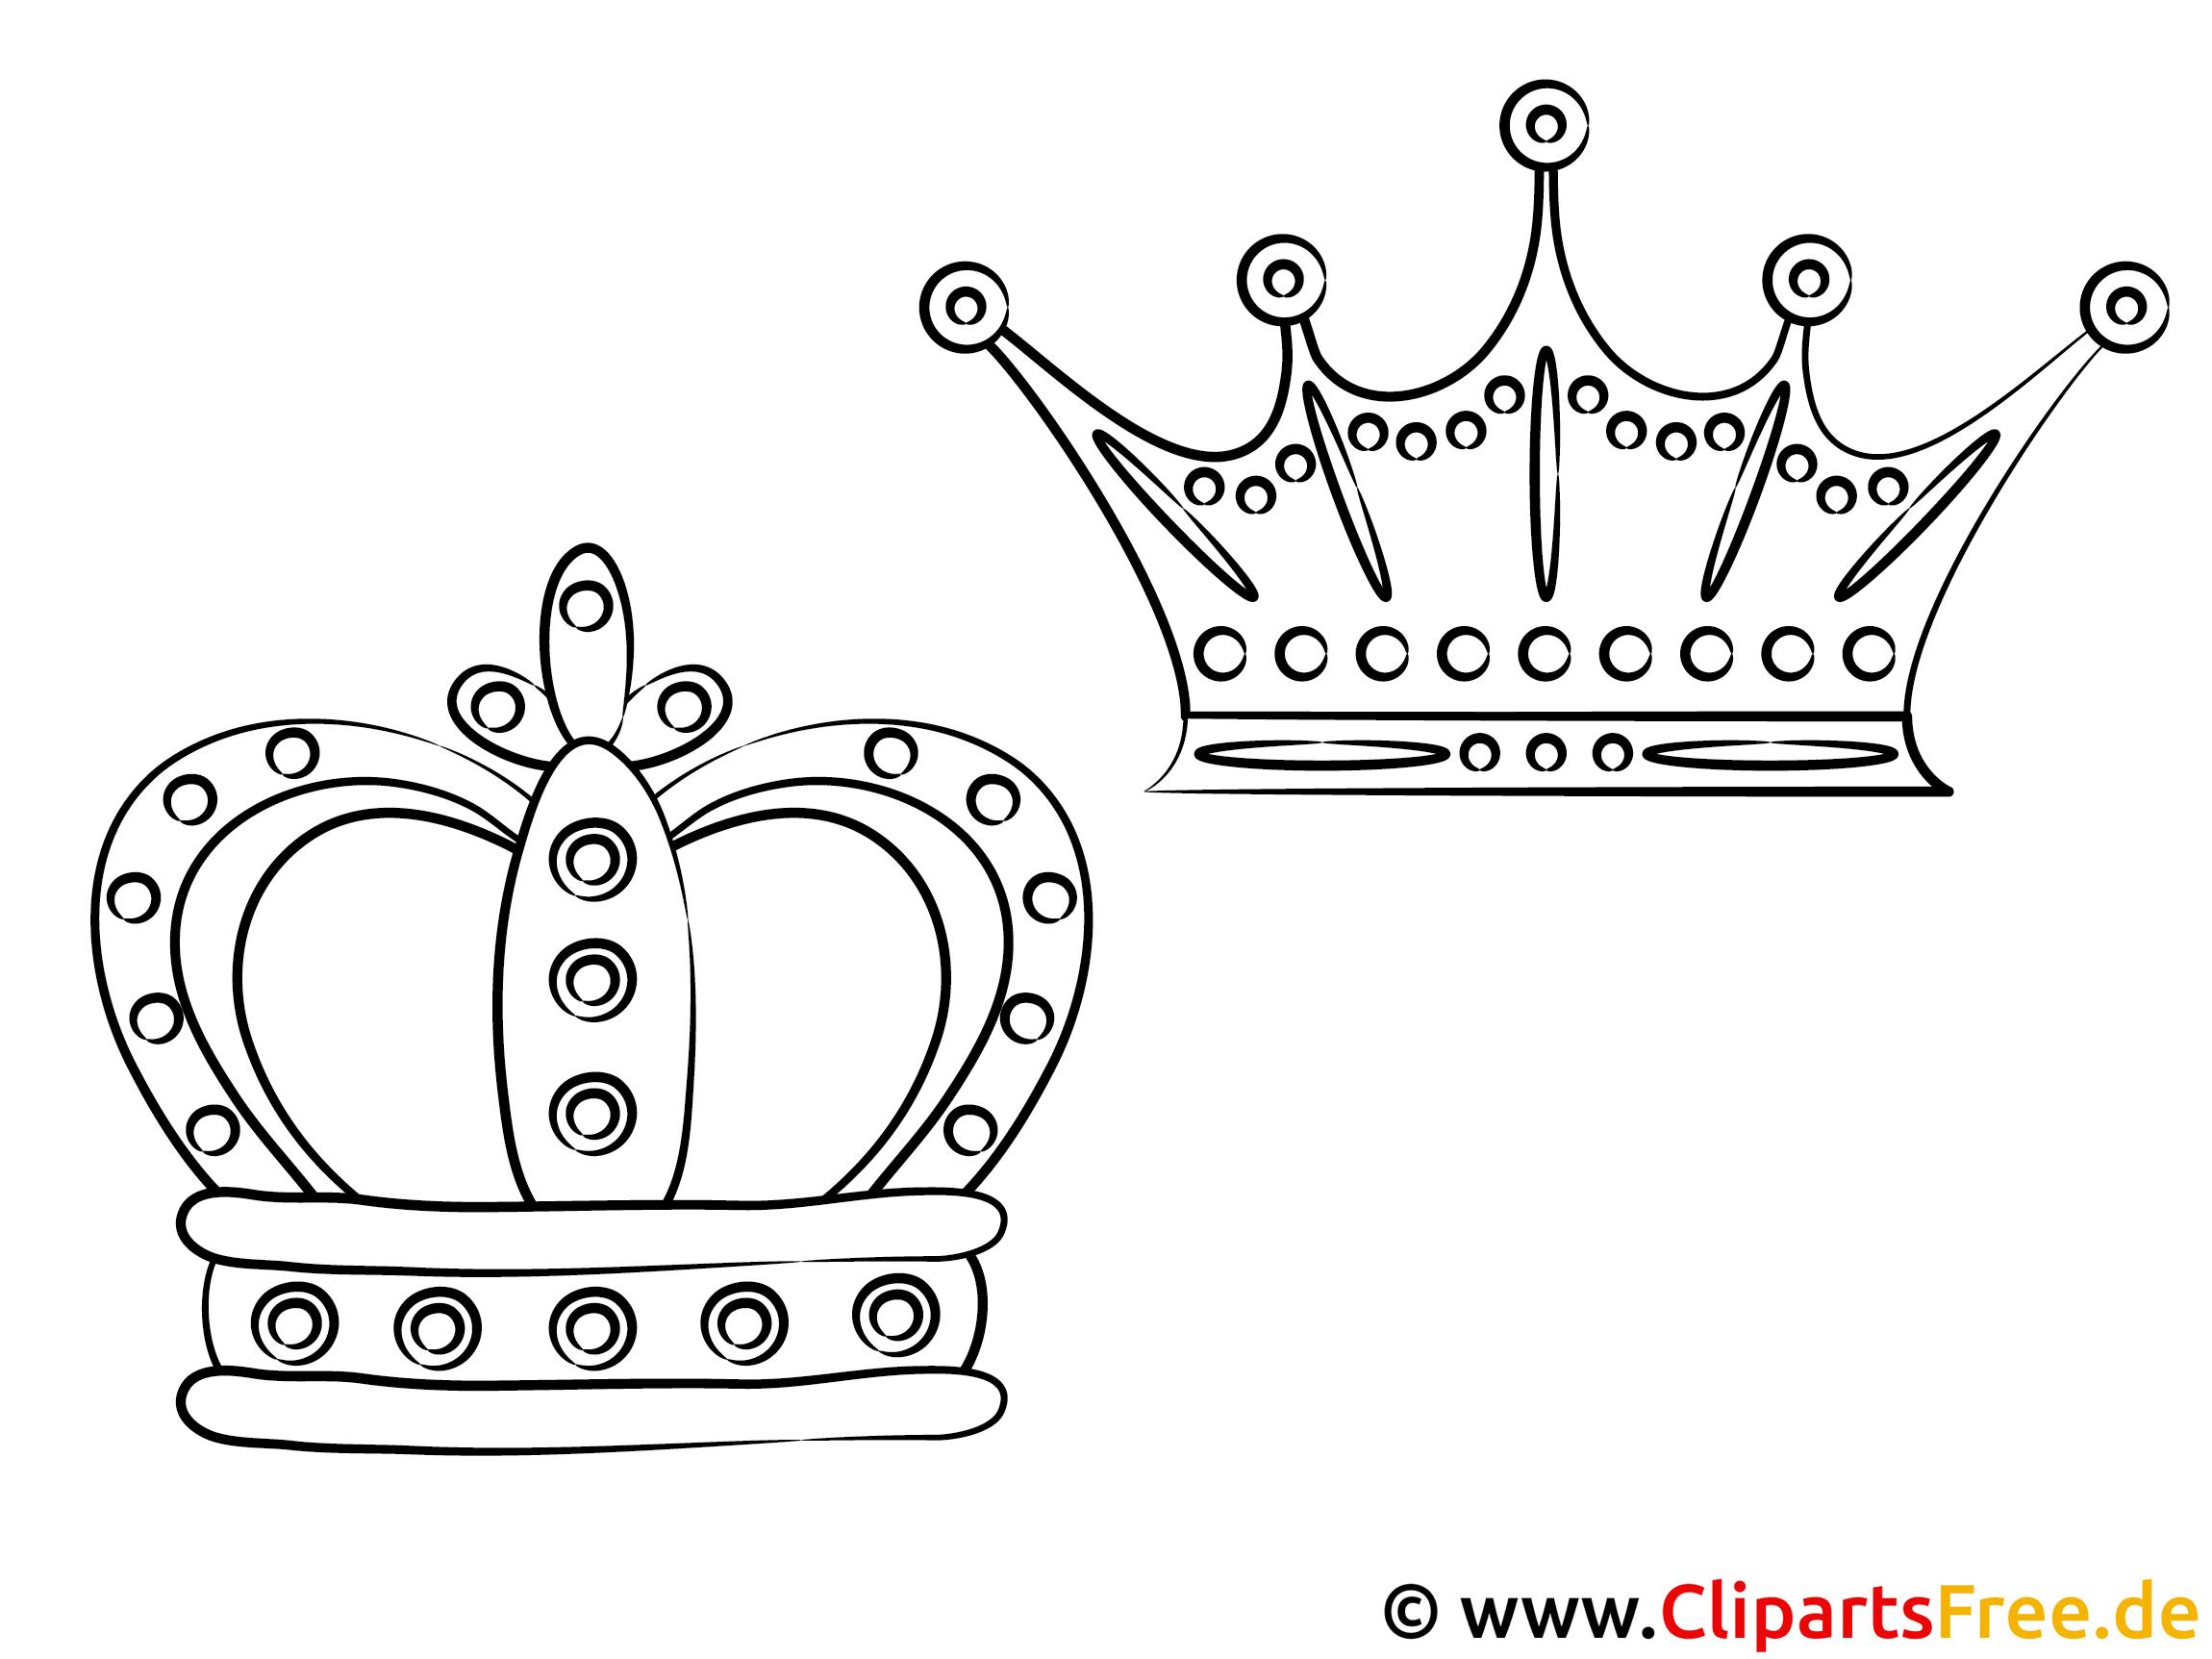 malvorlage krone prinzessin  Coloring and Malvorlagan